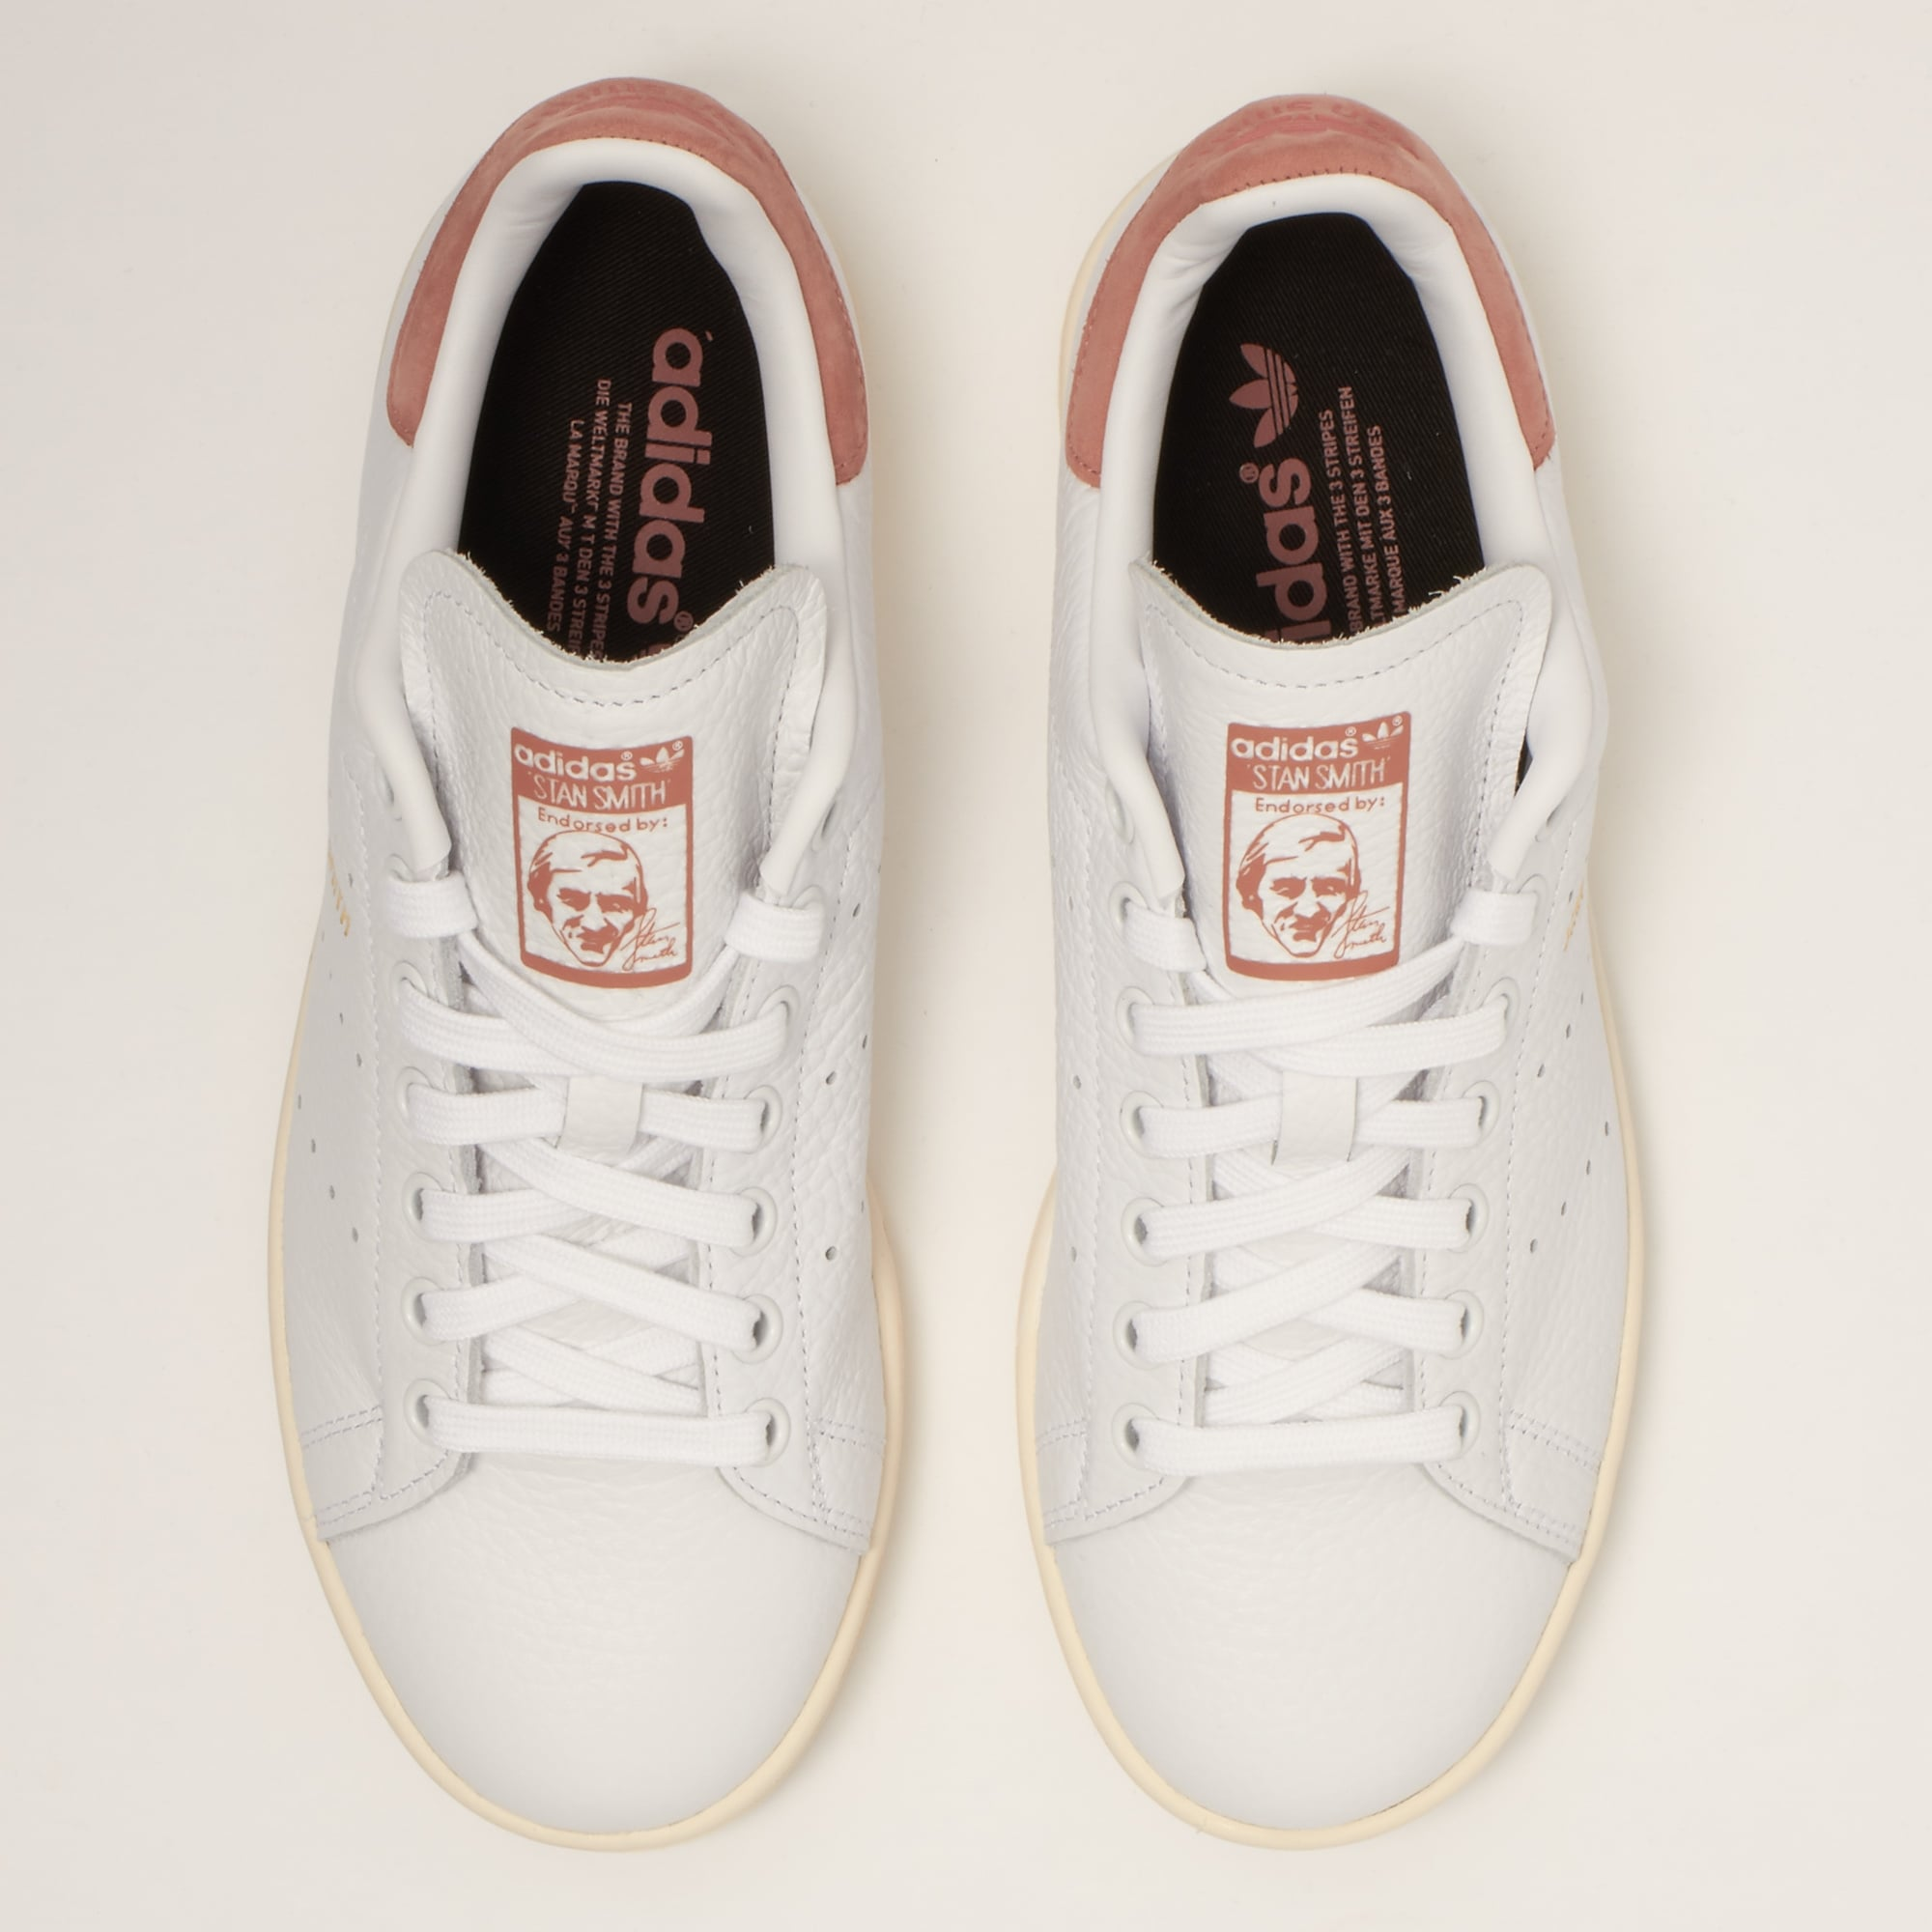 adidas original stan smith white/raw pink